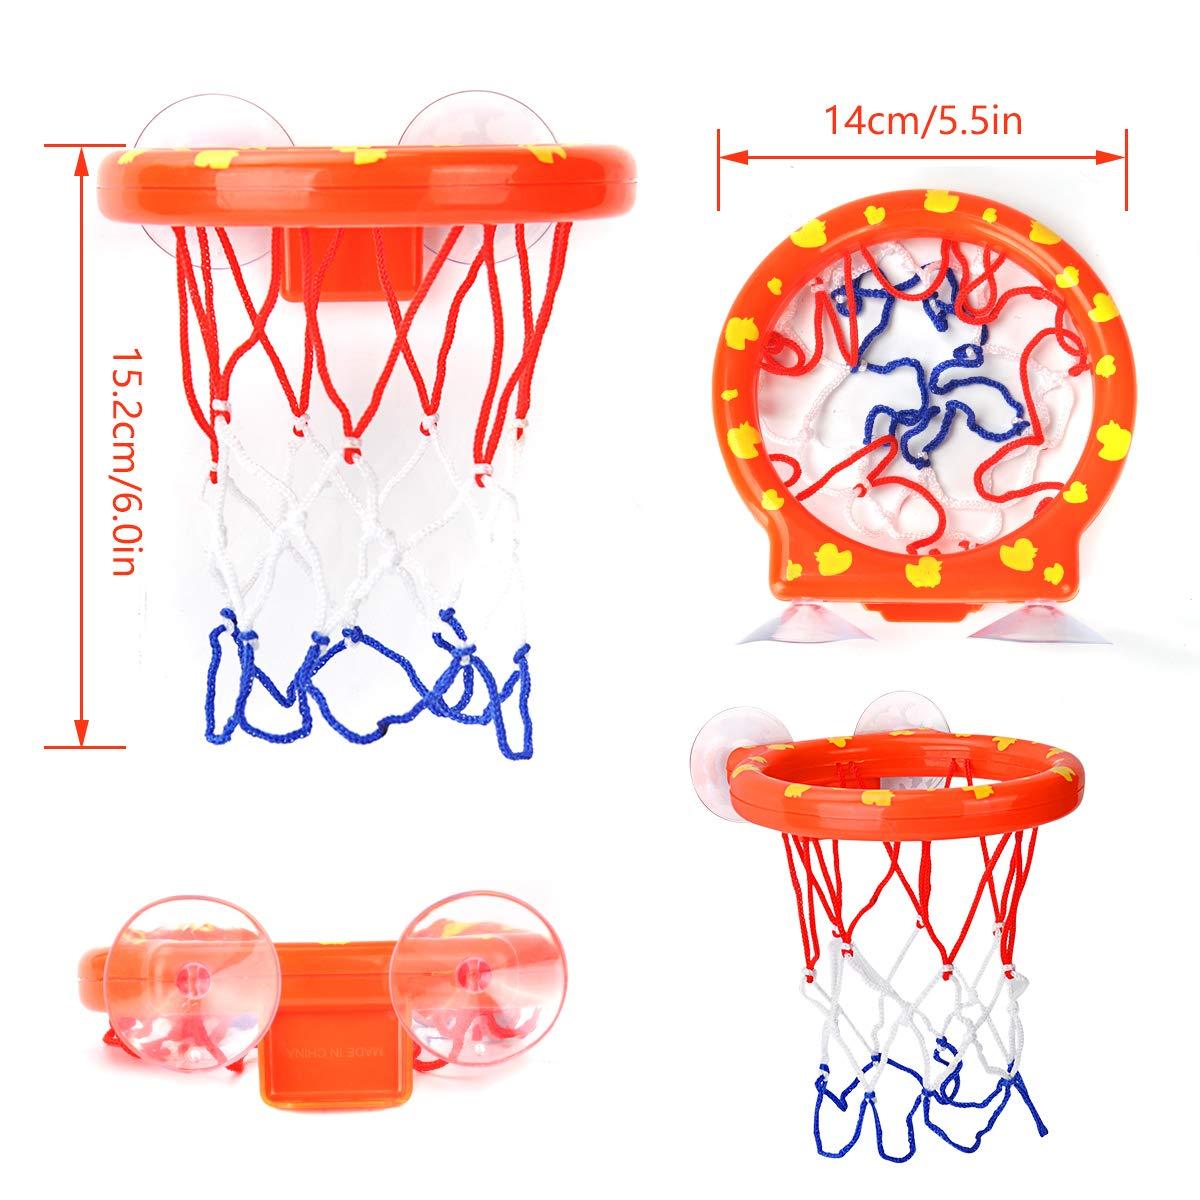 Cyfie Canasta Baloncesto Infantil Ba/ñera,Ganasta de Baloncesto Peque/ña de Pl/ástico con 3 Pelotas